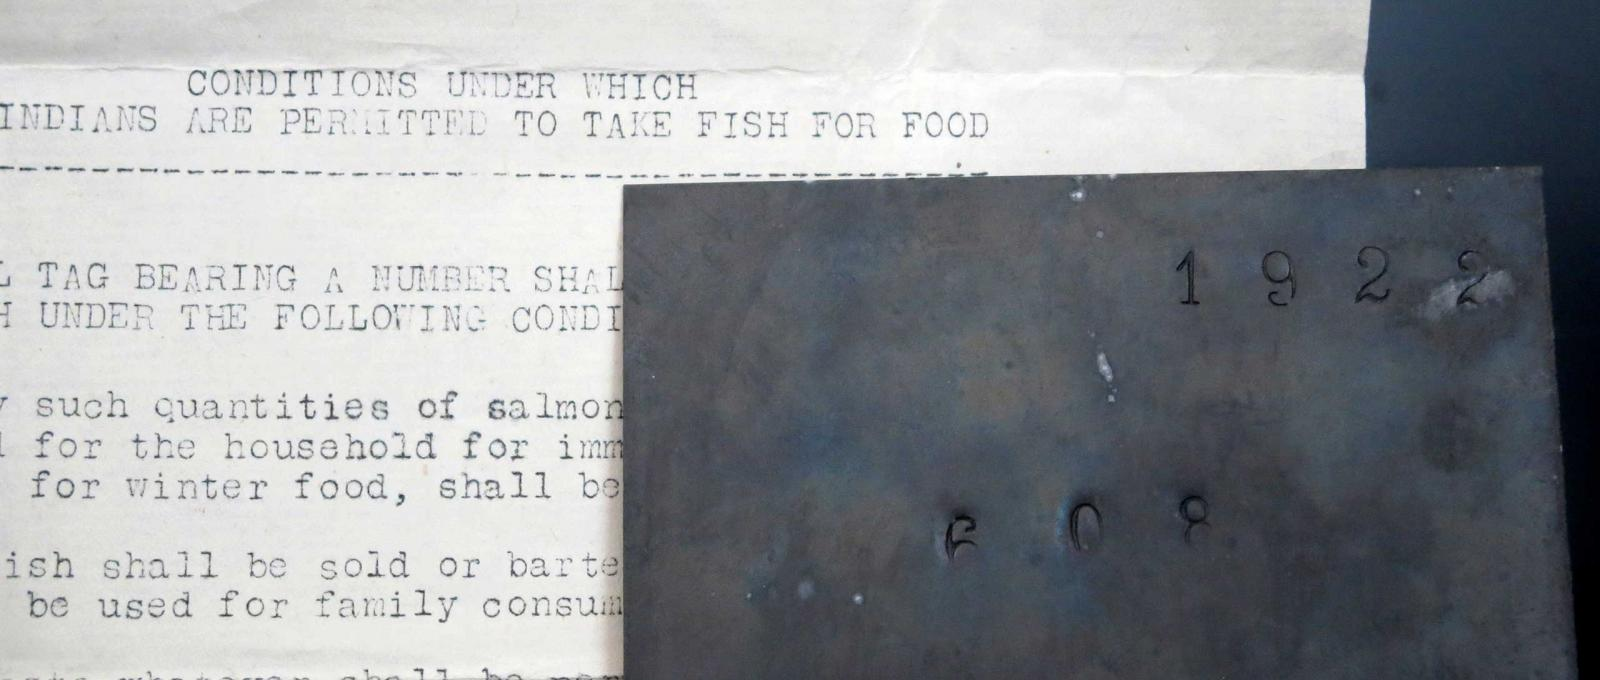 As Far as Possible, No Salmon